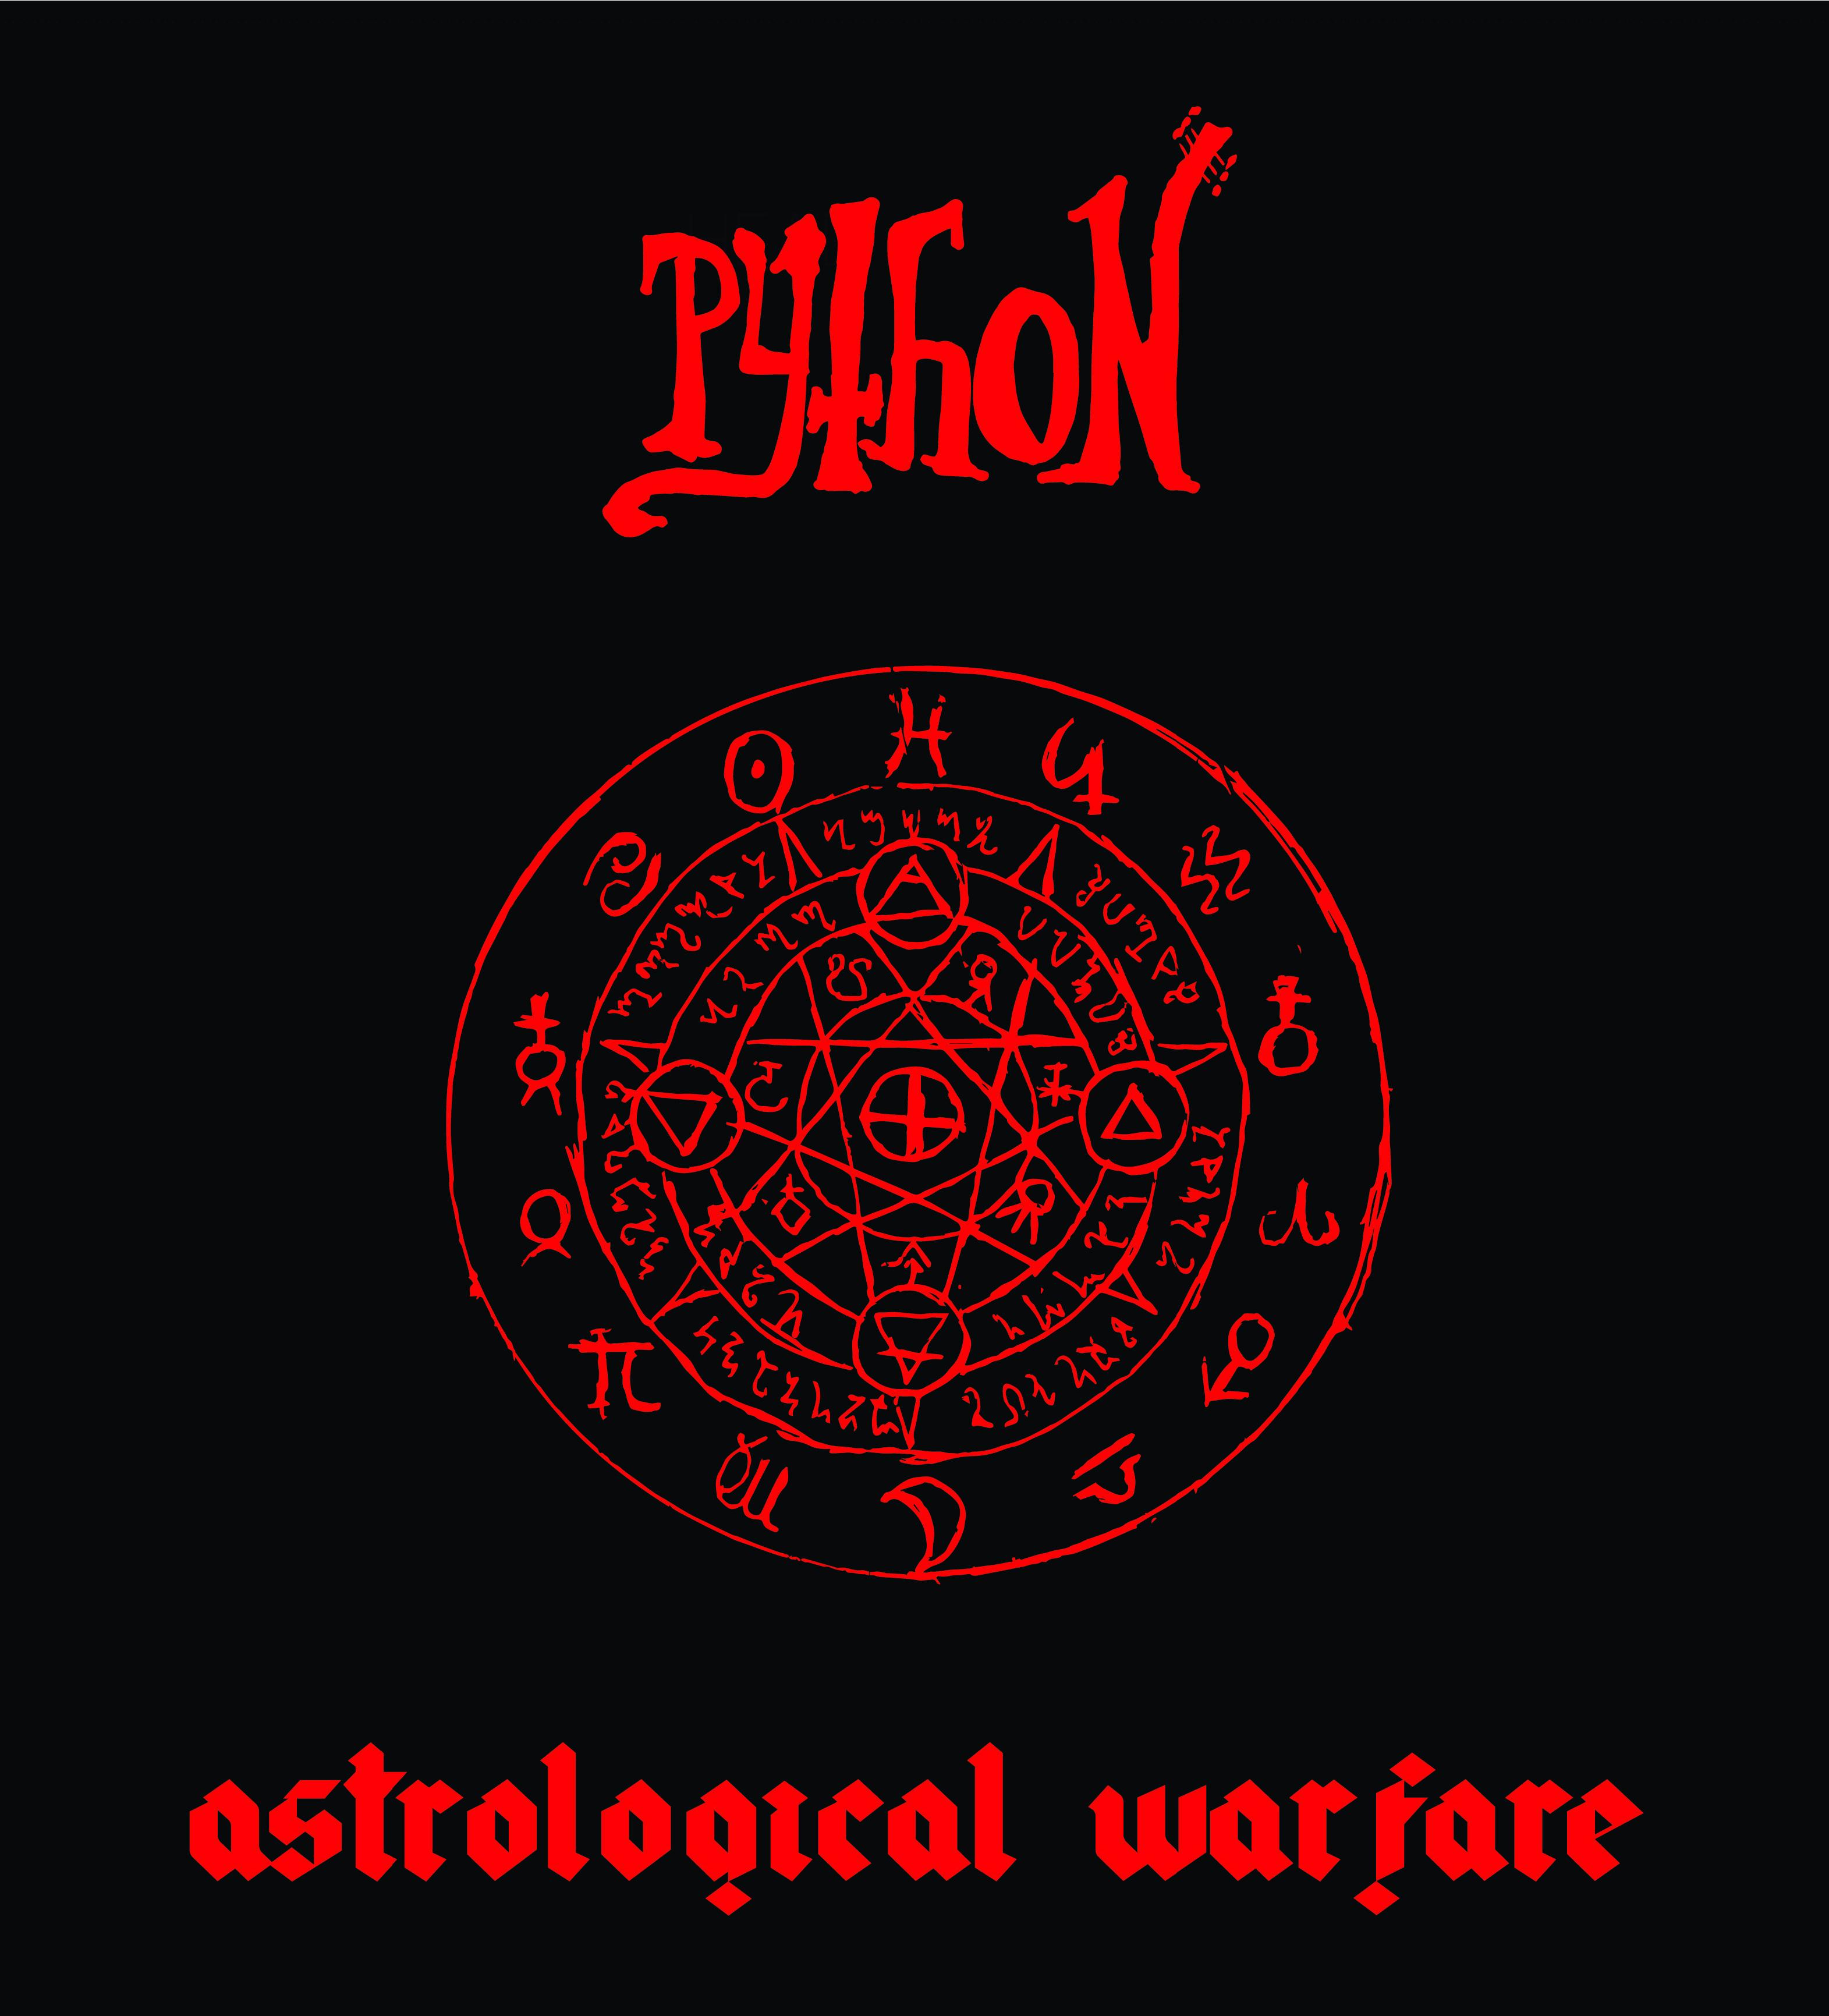 python astrological warfare